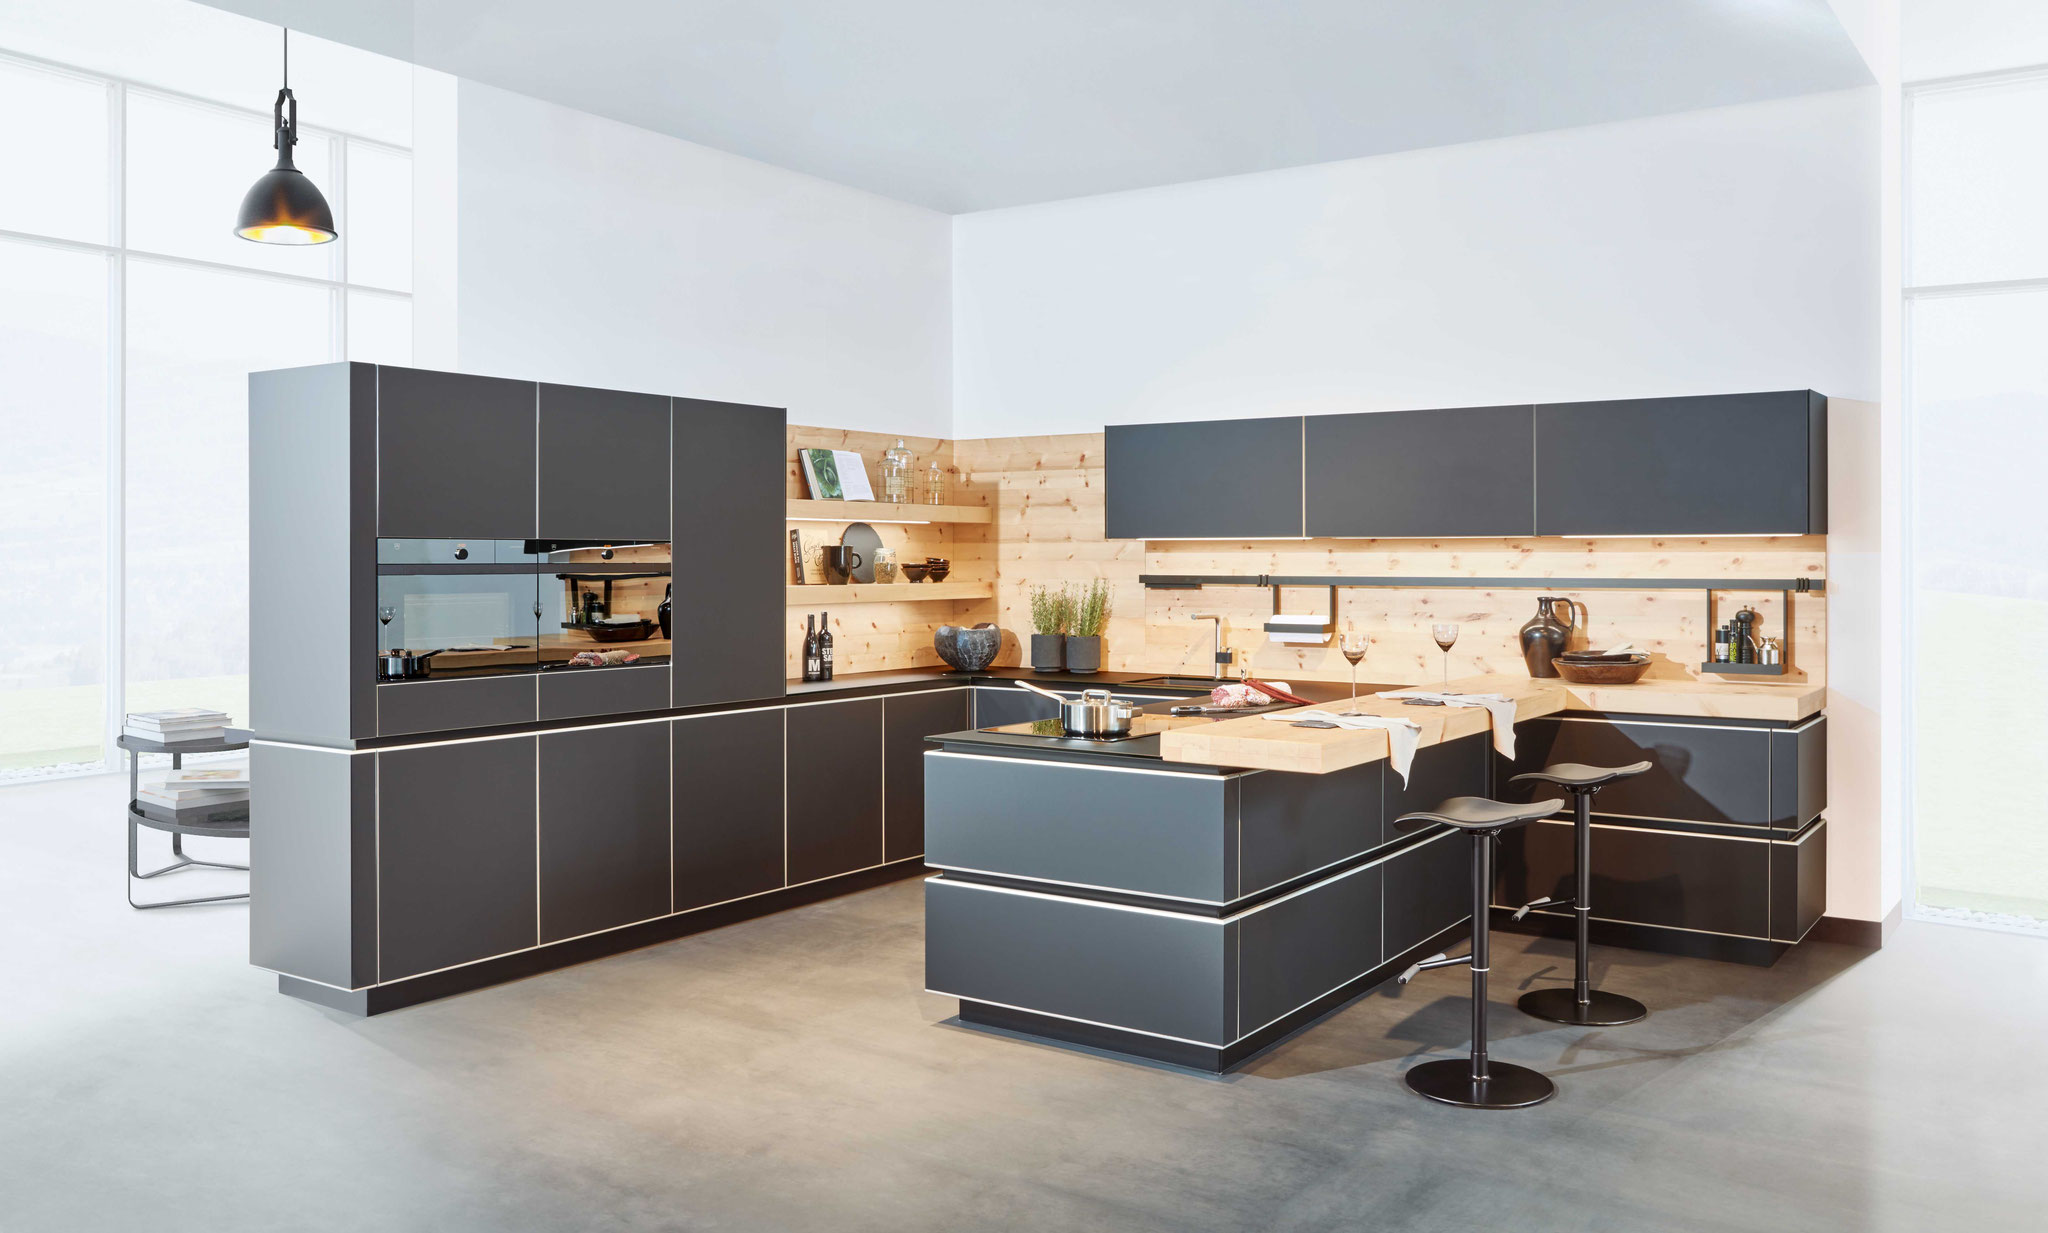 grifflose kueche erfahrung vor und nachteile. Black Bedroom Furniture Sets. Home Design Ideas